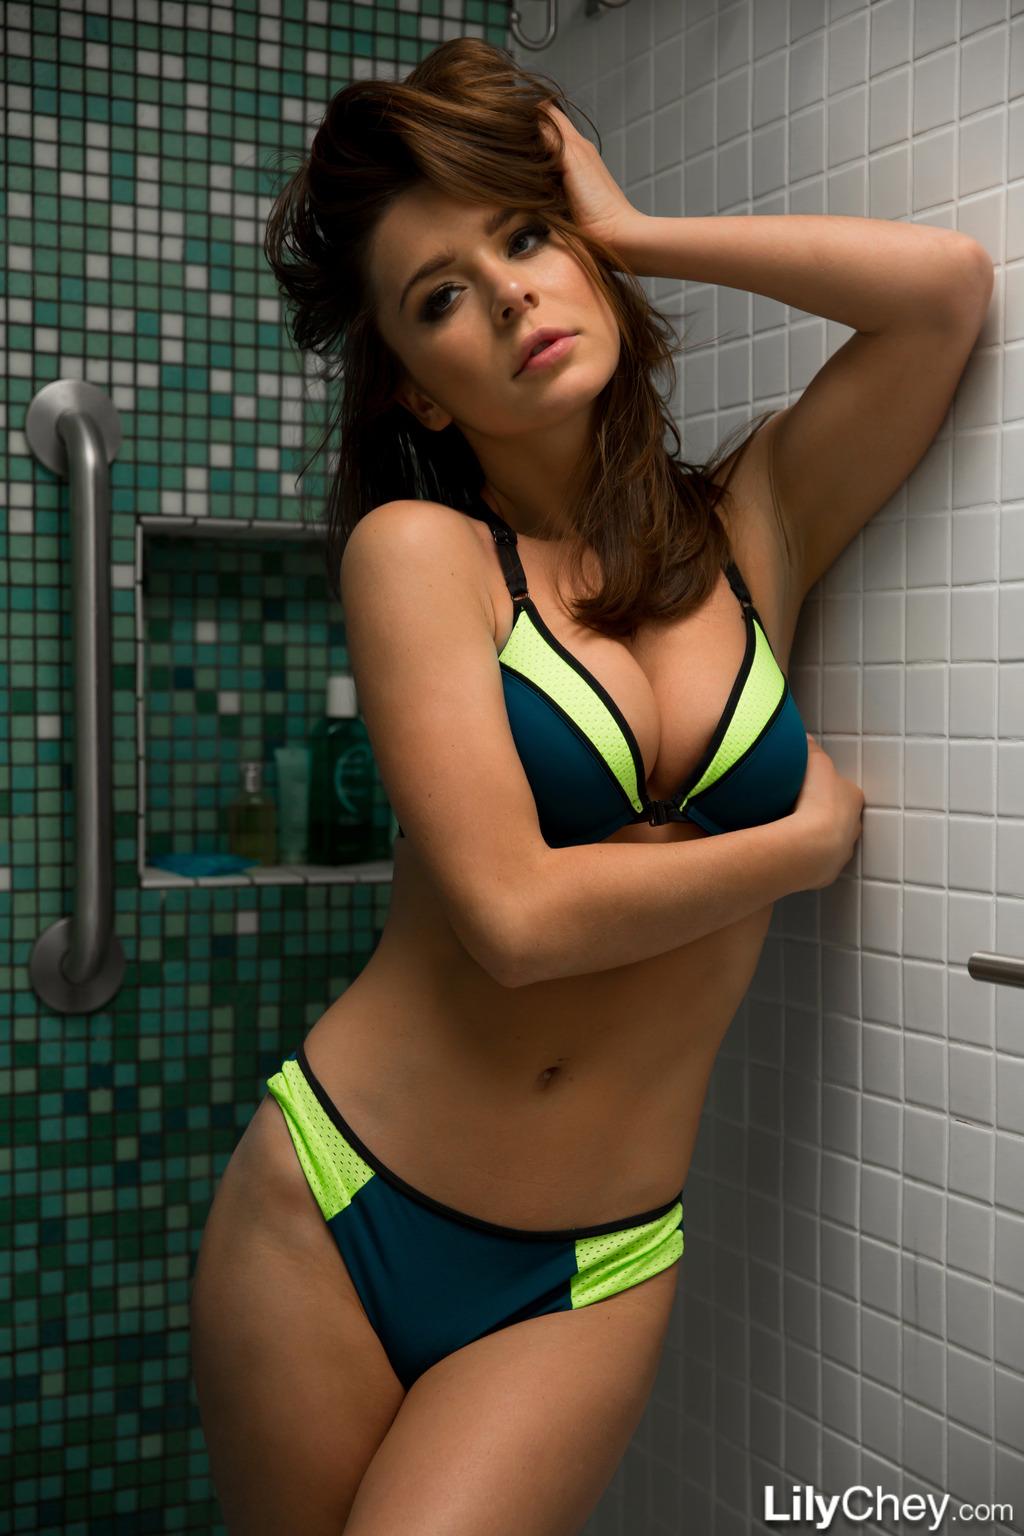 Lily Chey In Bikini Shower 09